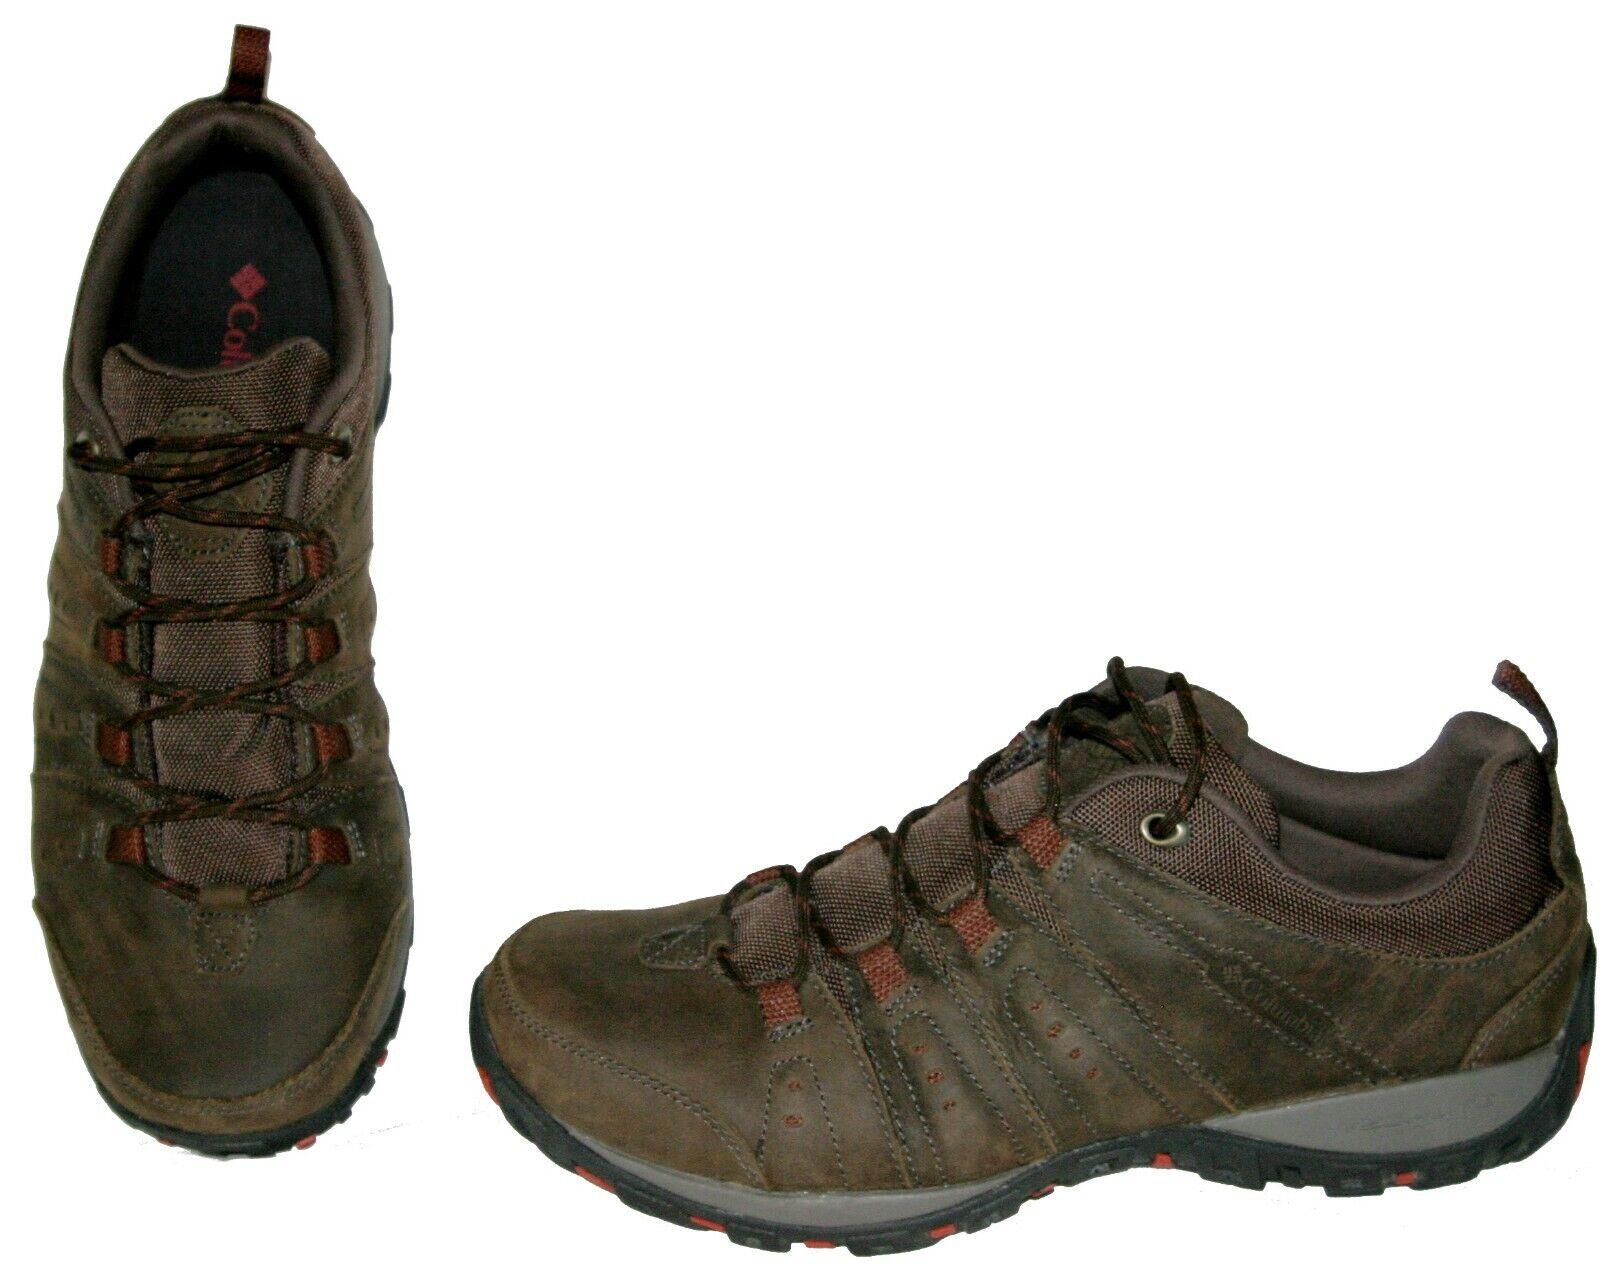 Columbia PeakFreak Woodburn Plus BM3974 231 Hiking shoes Brown Leather 11 Men A+